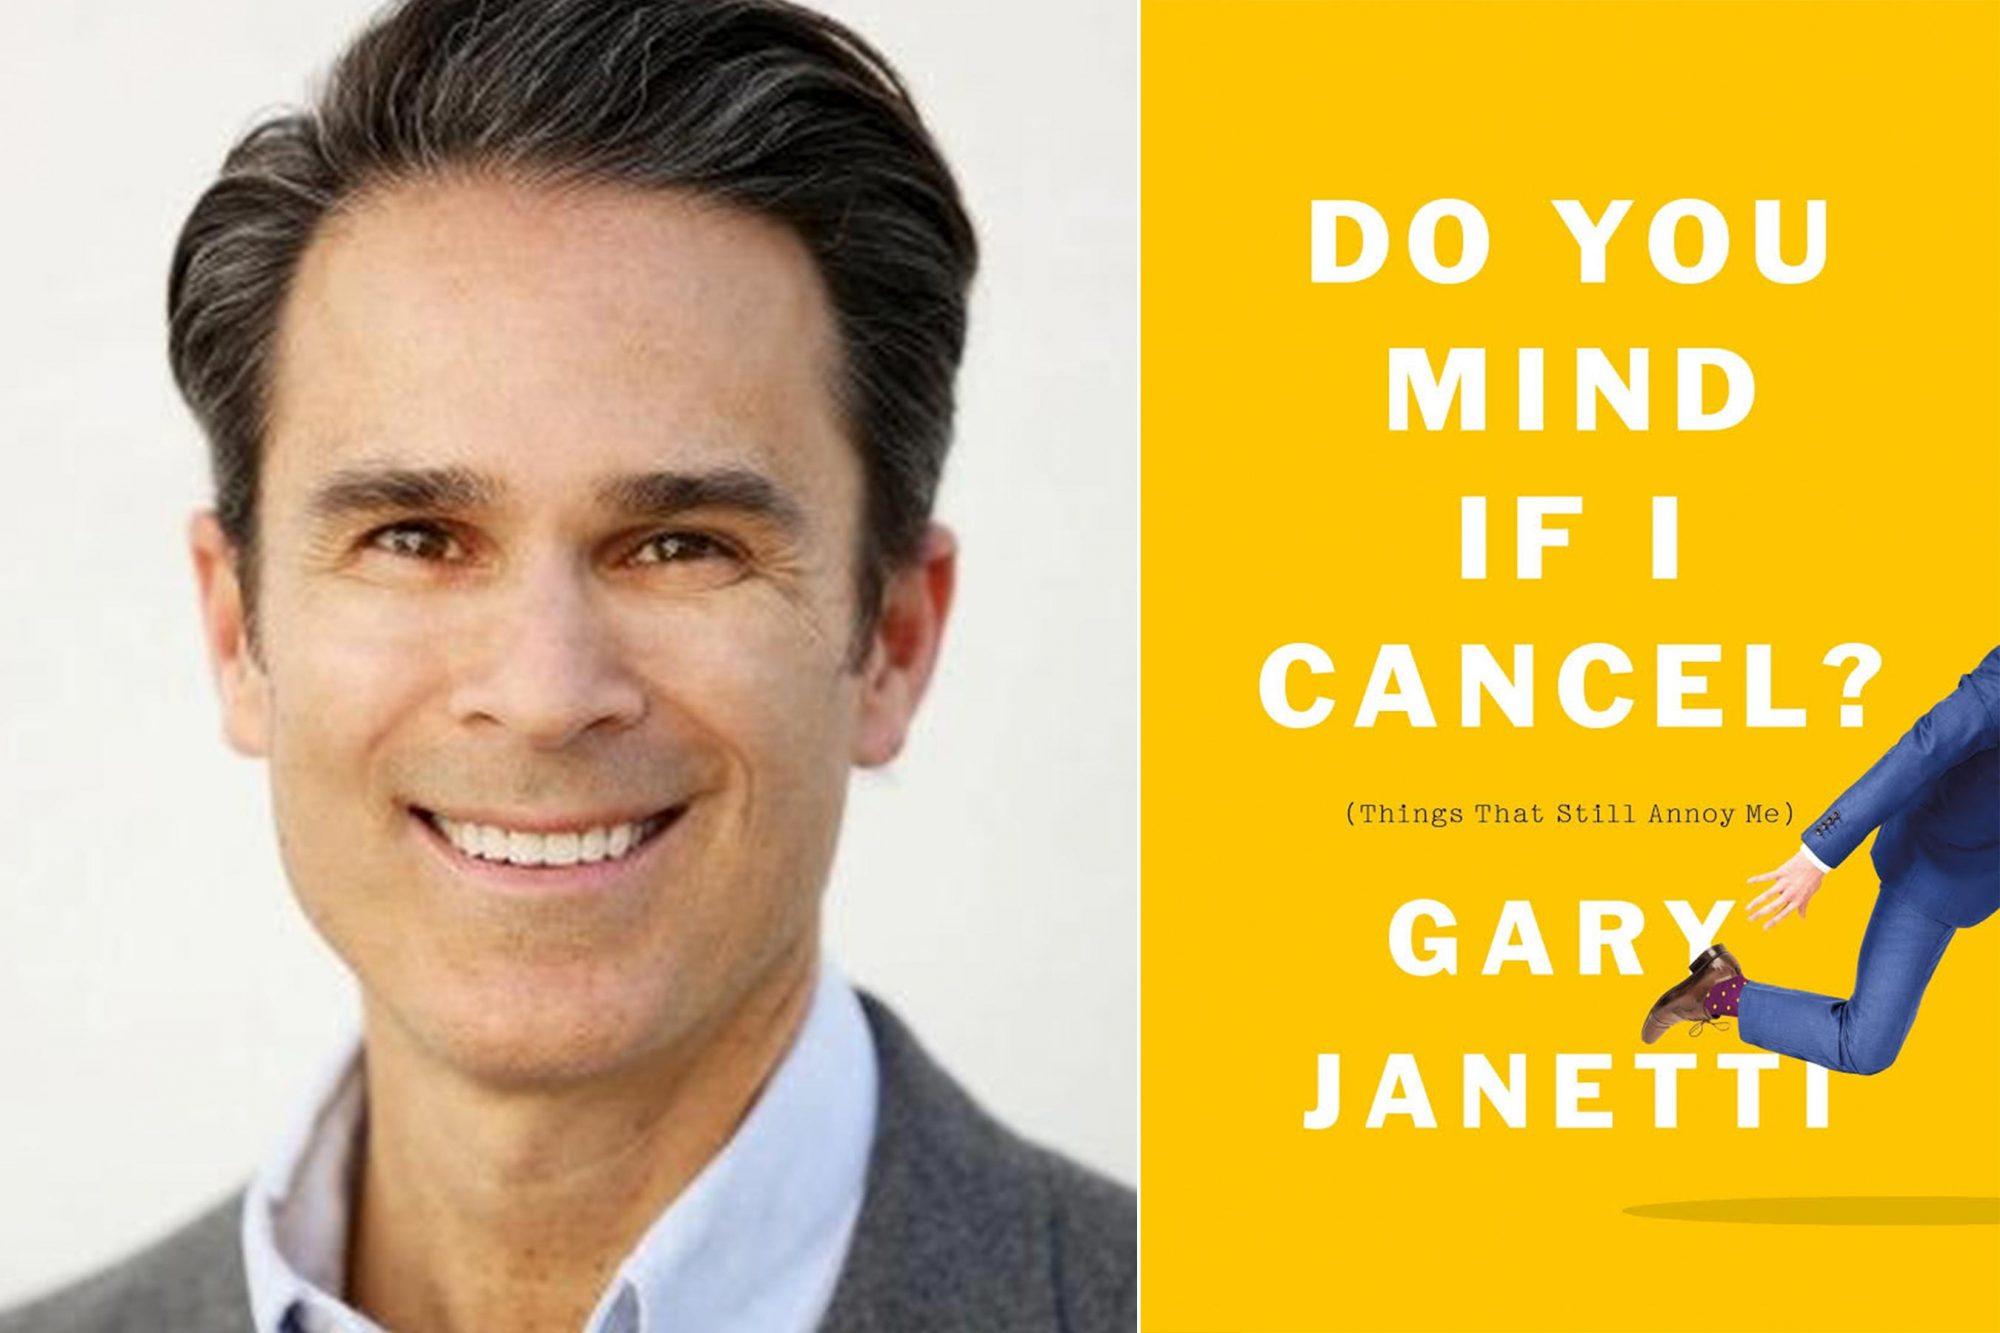 Gary Janetti / Do You Mind If I Cancel?